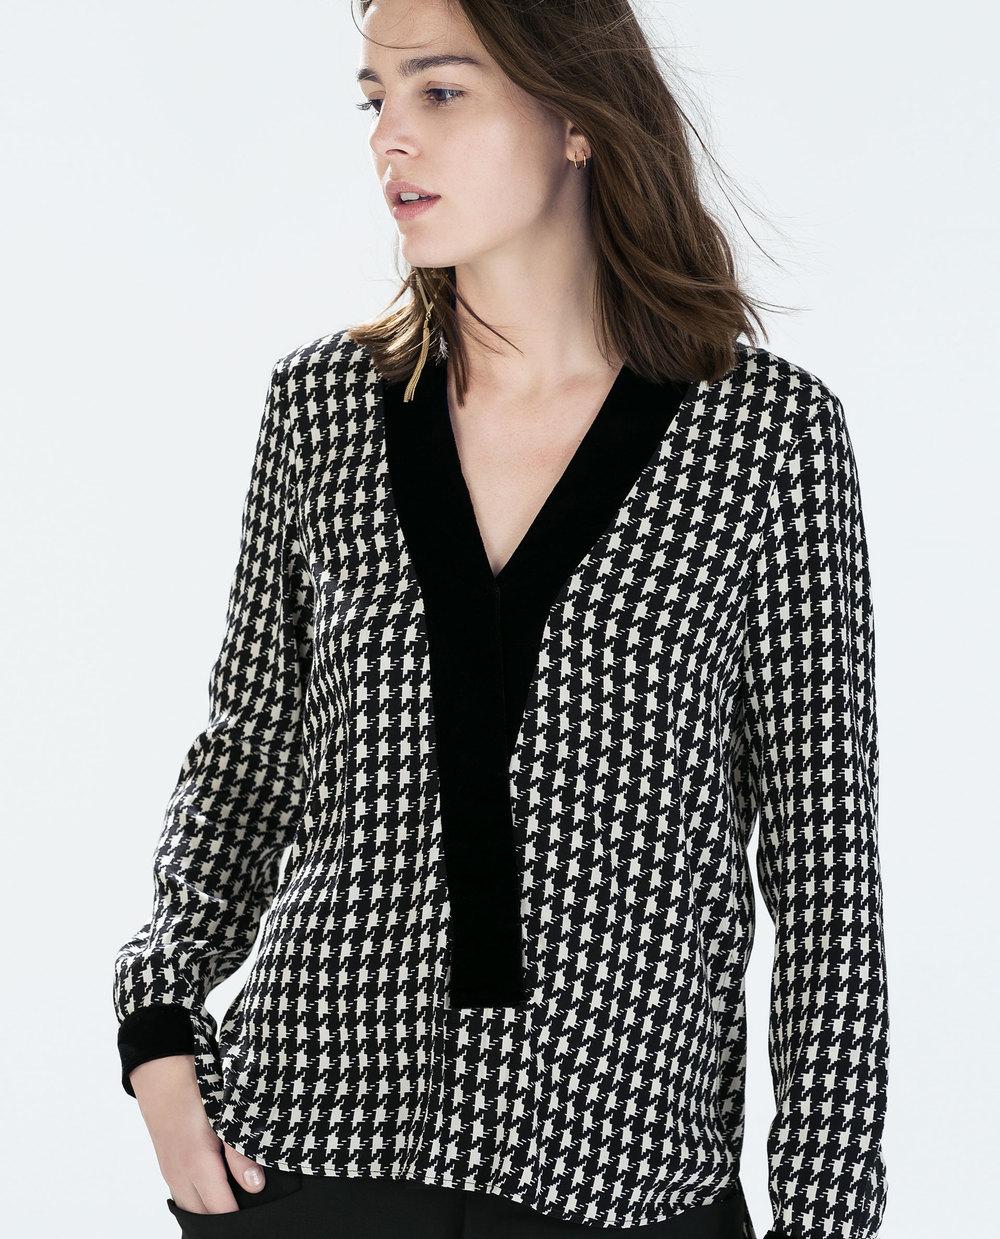 Kimono Collar Women Casual Check Shirt Design - Buy Women Casual ...